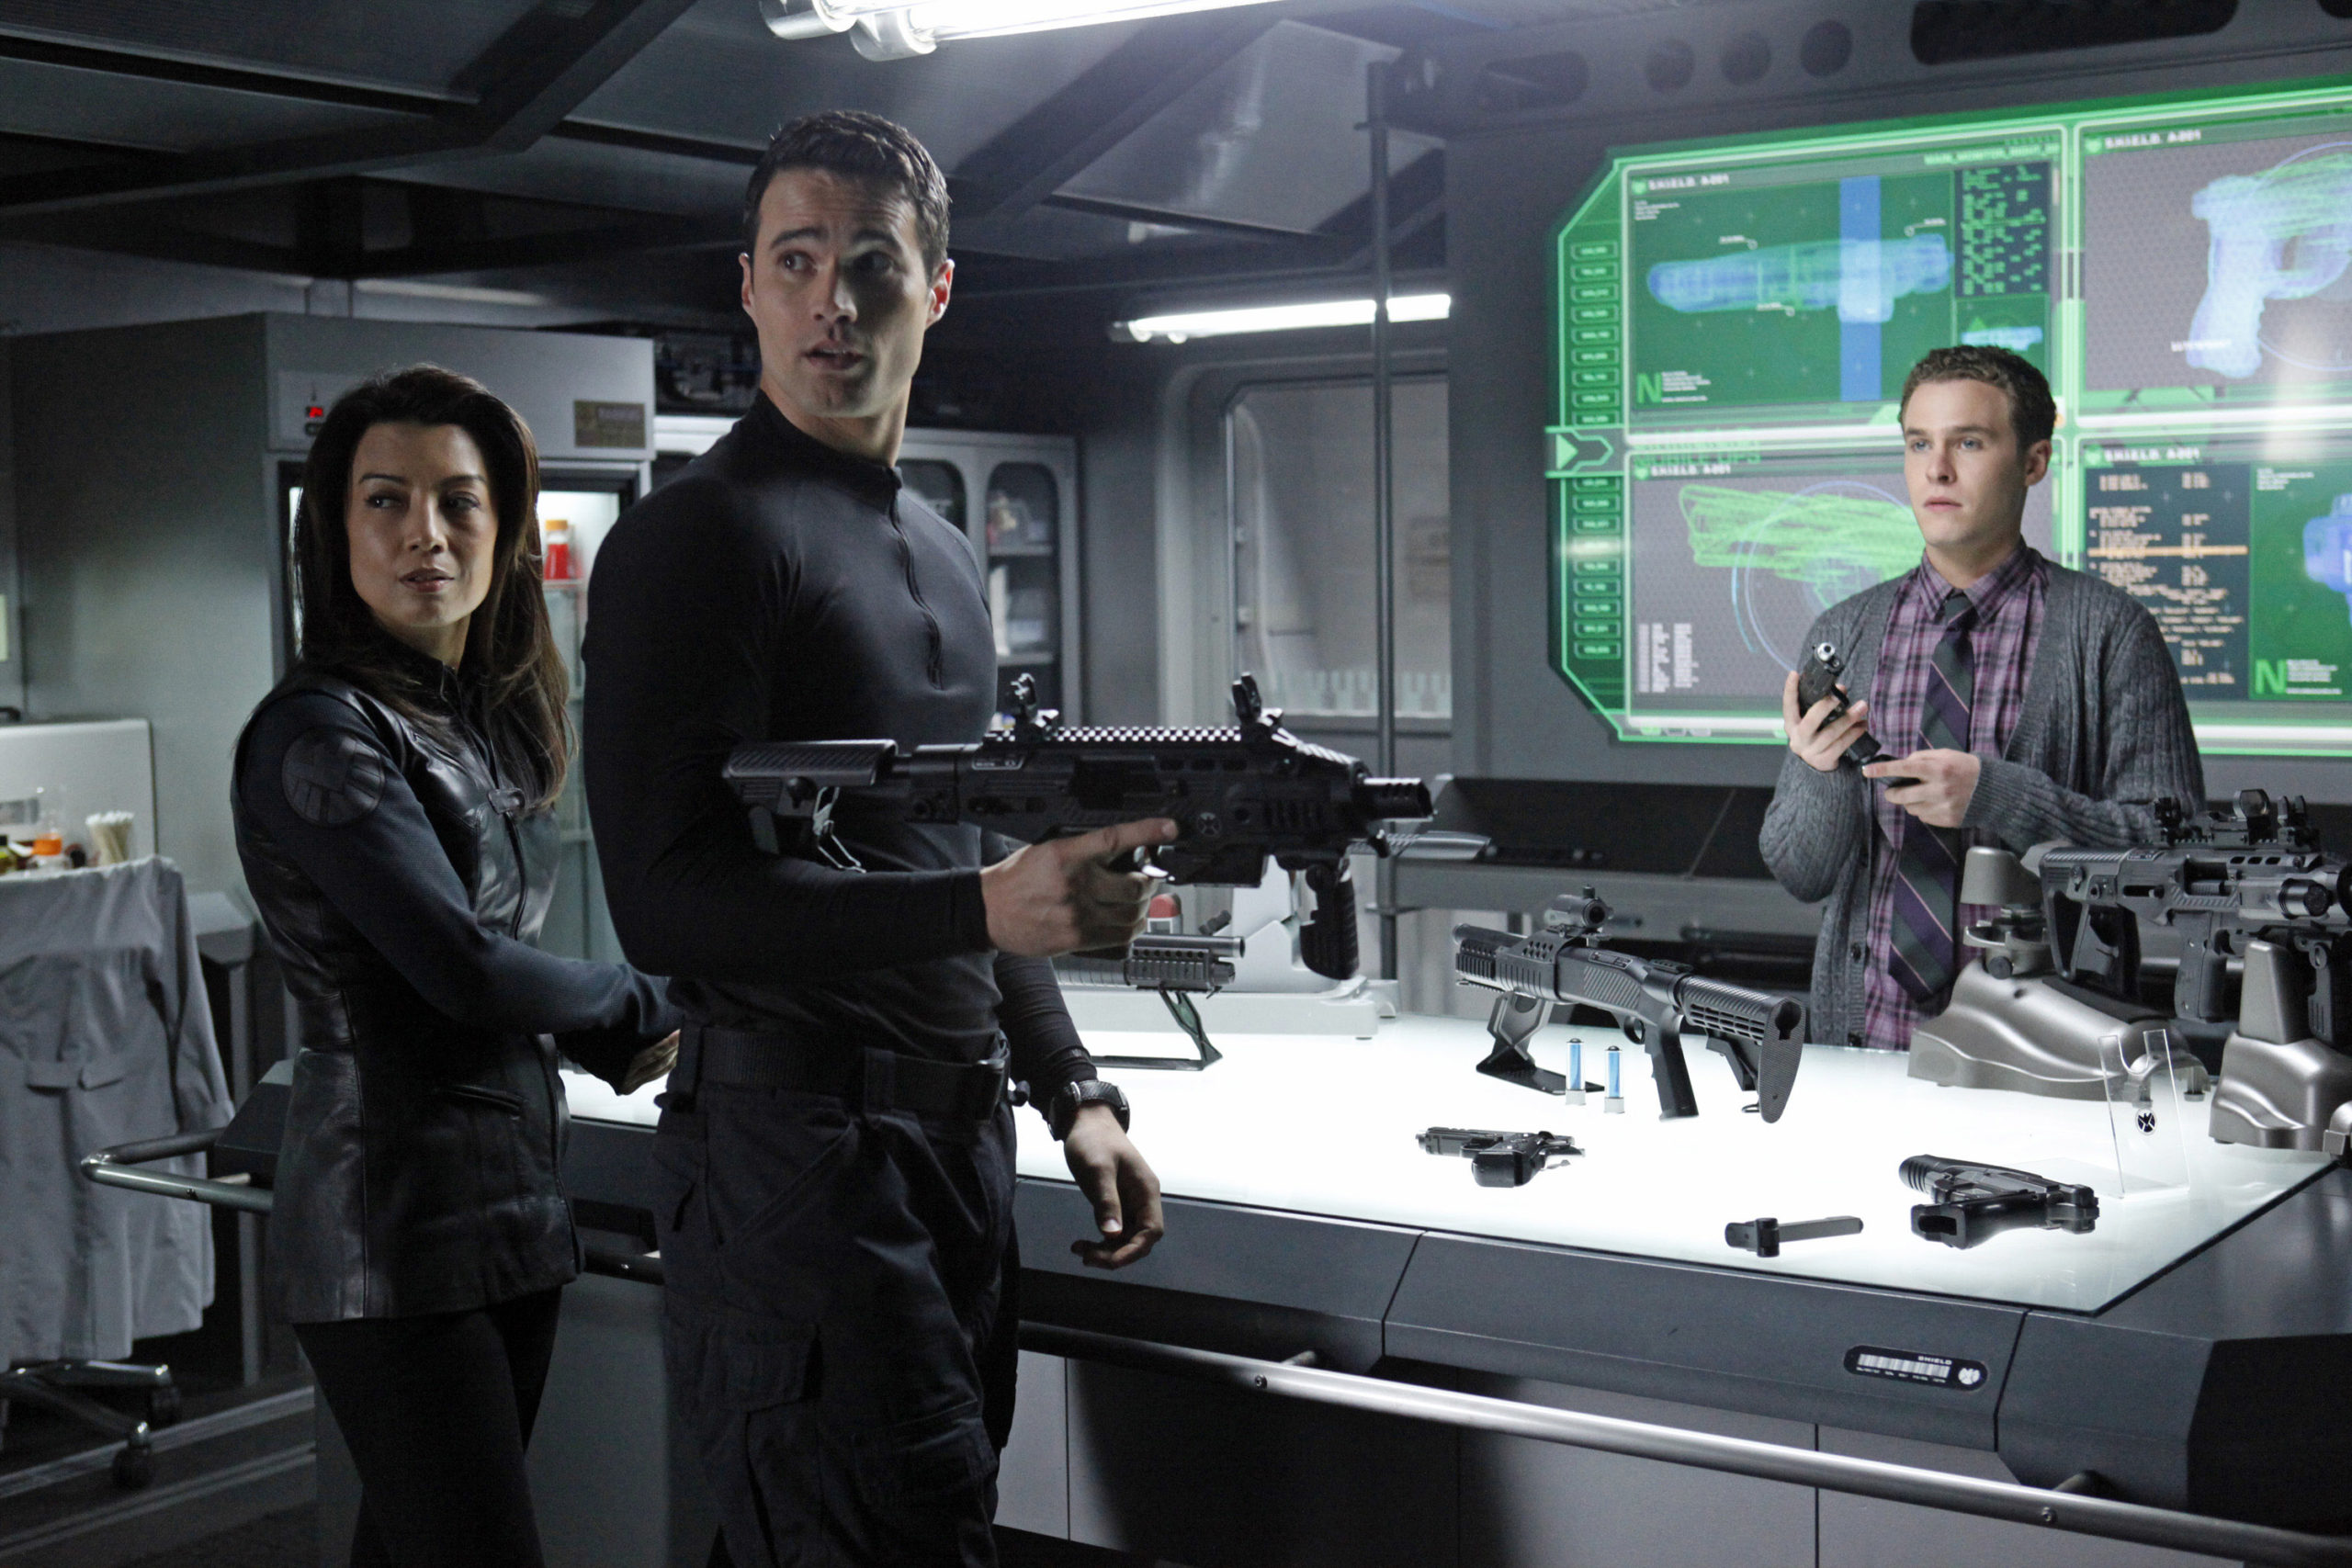 marvel-agents-of-shield-season-1-episode-15-dvdbash-02